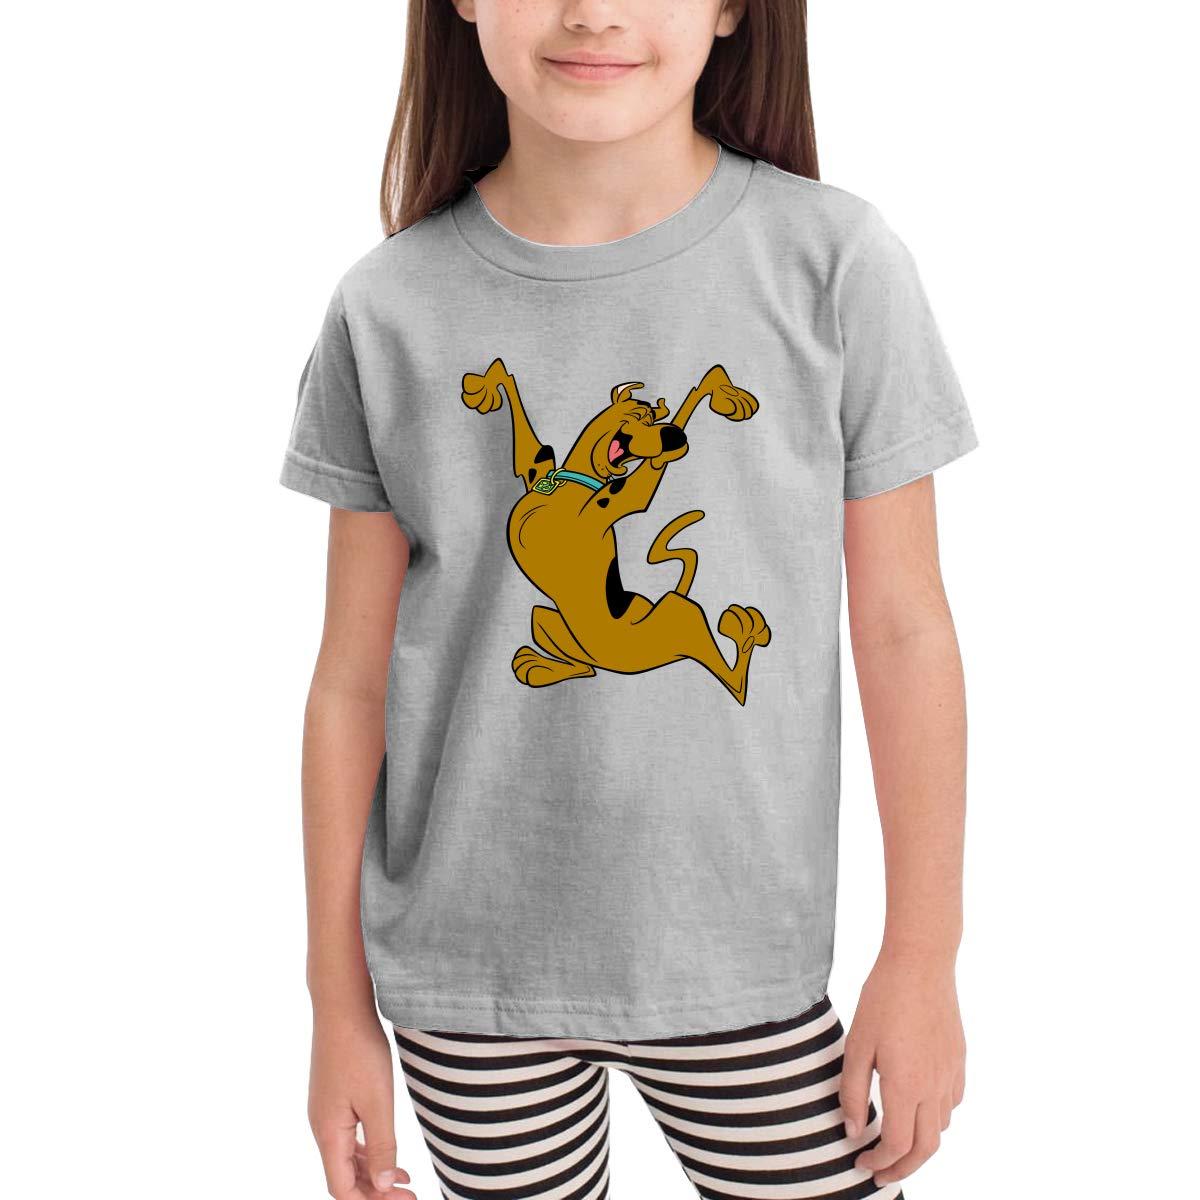 Scooby-doo Kids Crew Neck 100/% Soft Cotton Short Shirts Tees T-Shirts